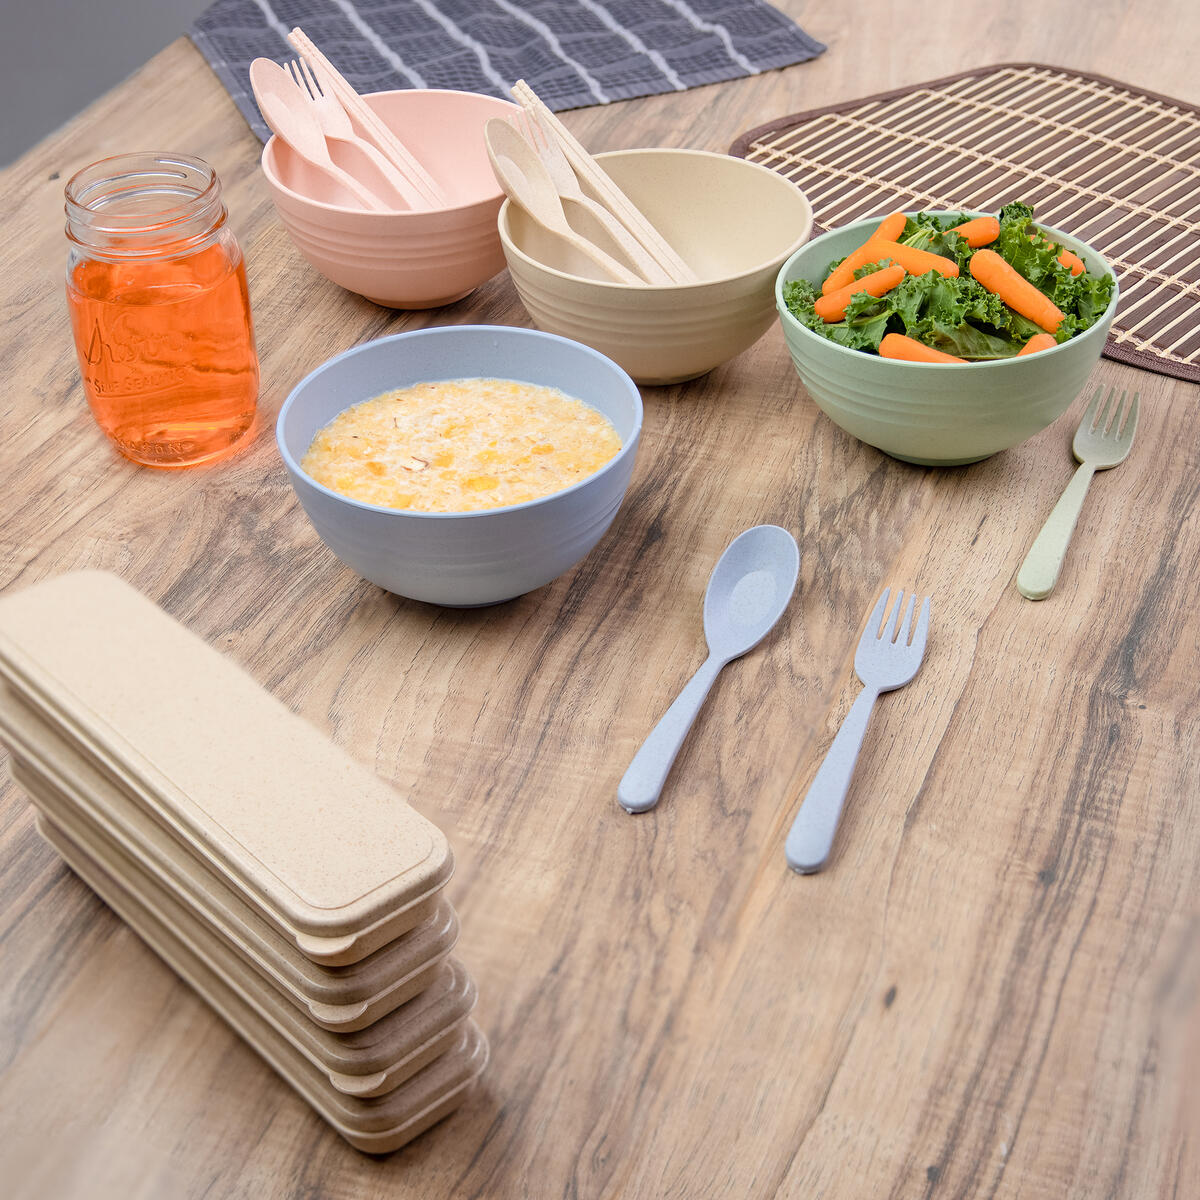 4 sets of eco-friendly Wheat Straw bowl set, Unbreakable Biodegradable ramen bowls, cereal bowls set with utensils, Zero Plastic, Zero Waste